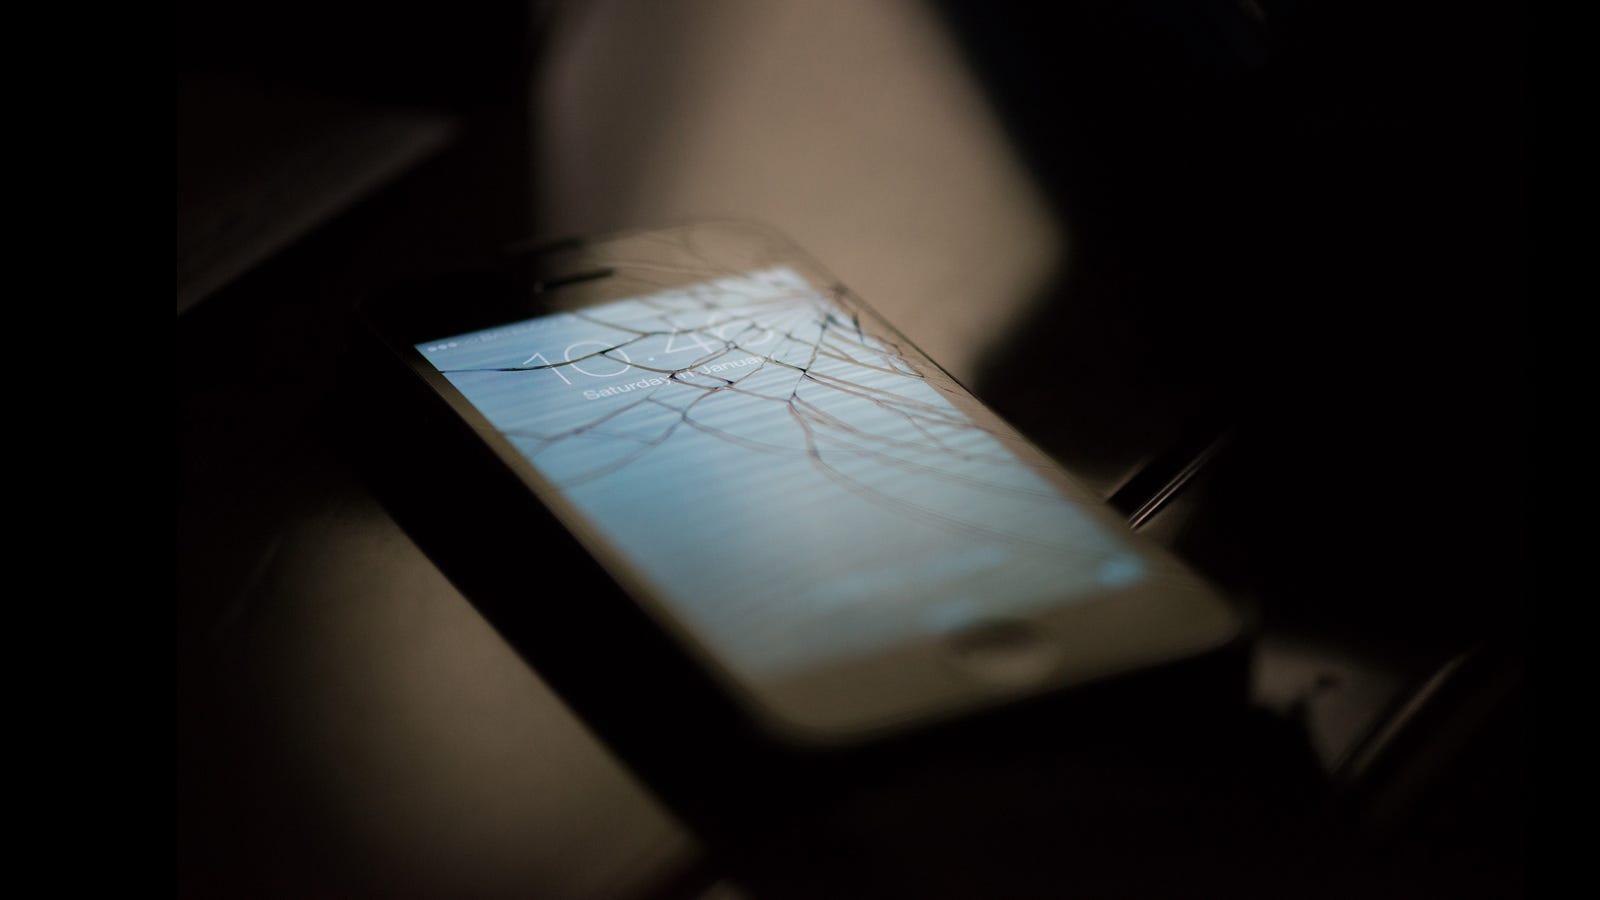 Apple Just Made its Top Secret iPhone Screen Repair Machine a Little Less Secret